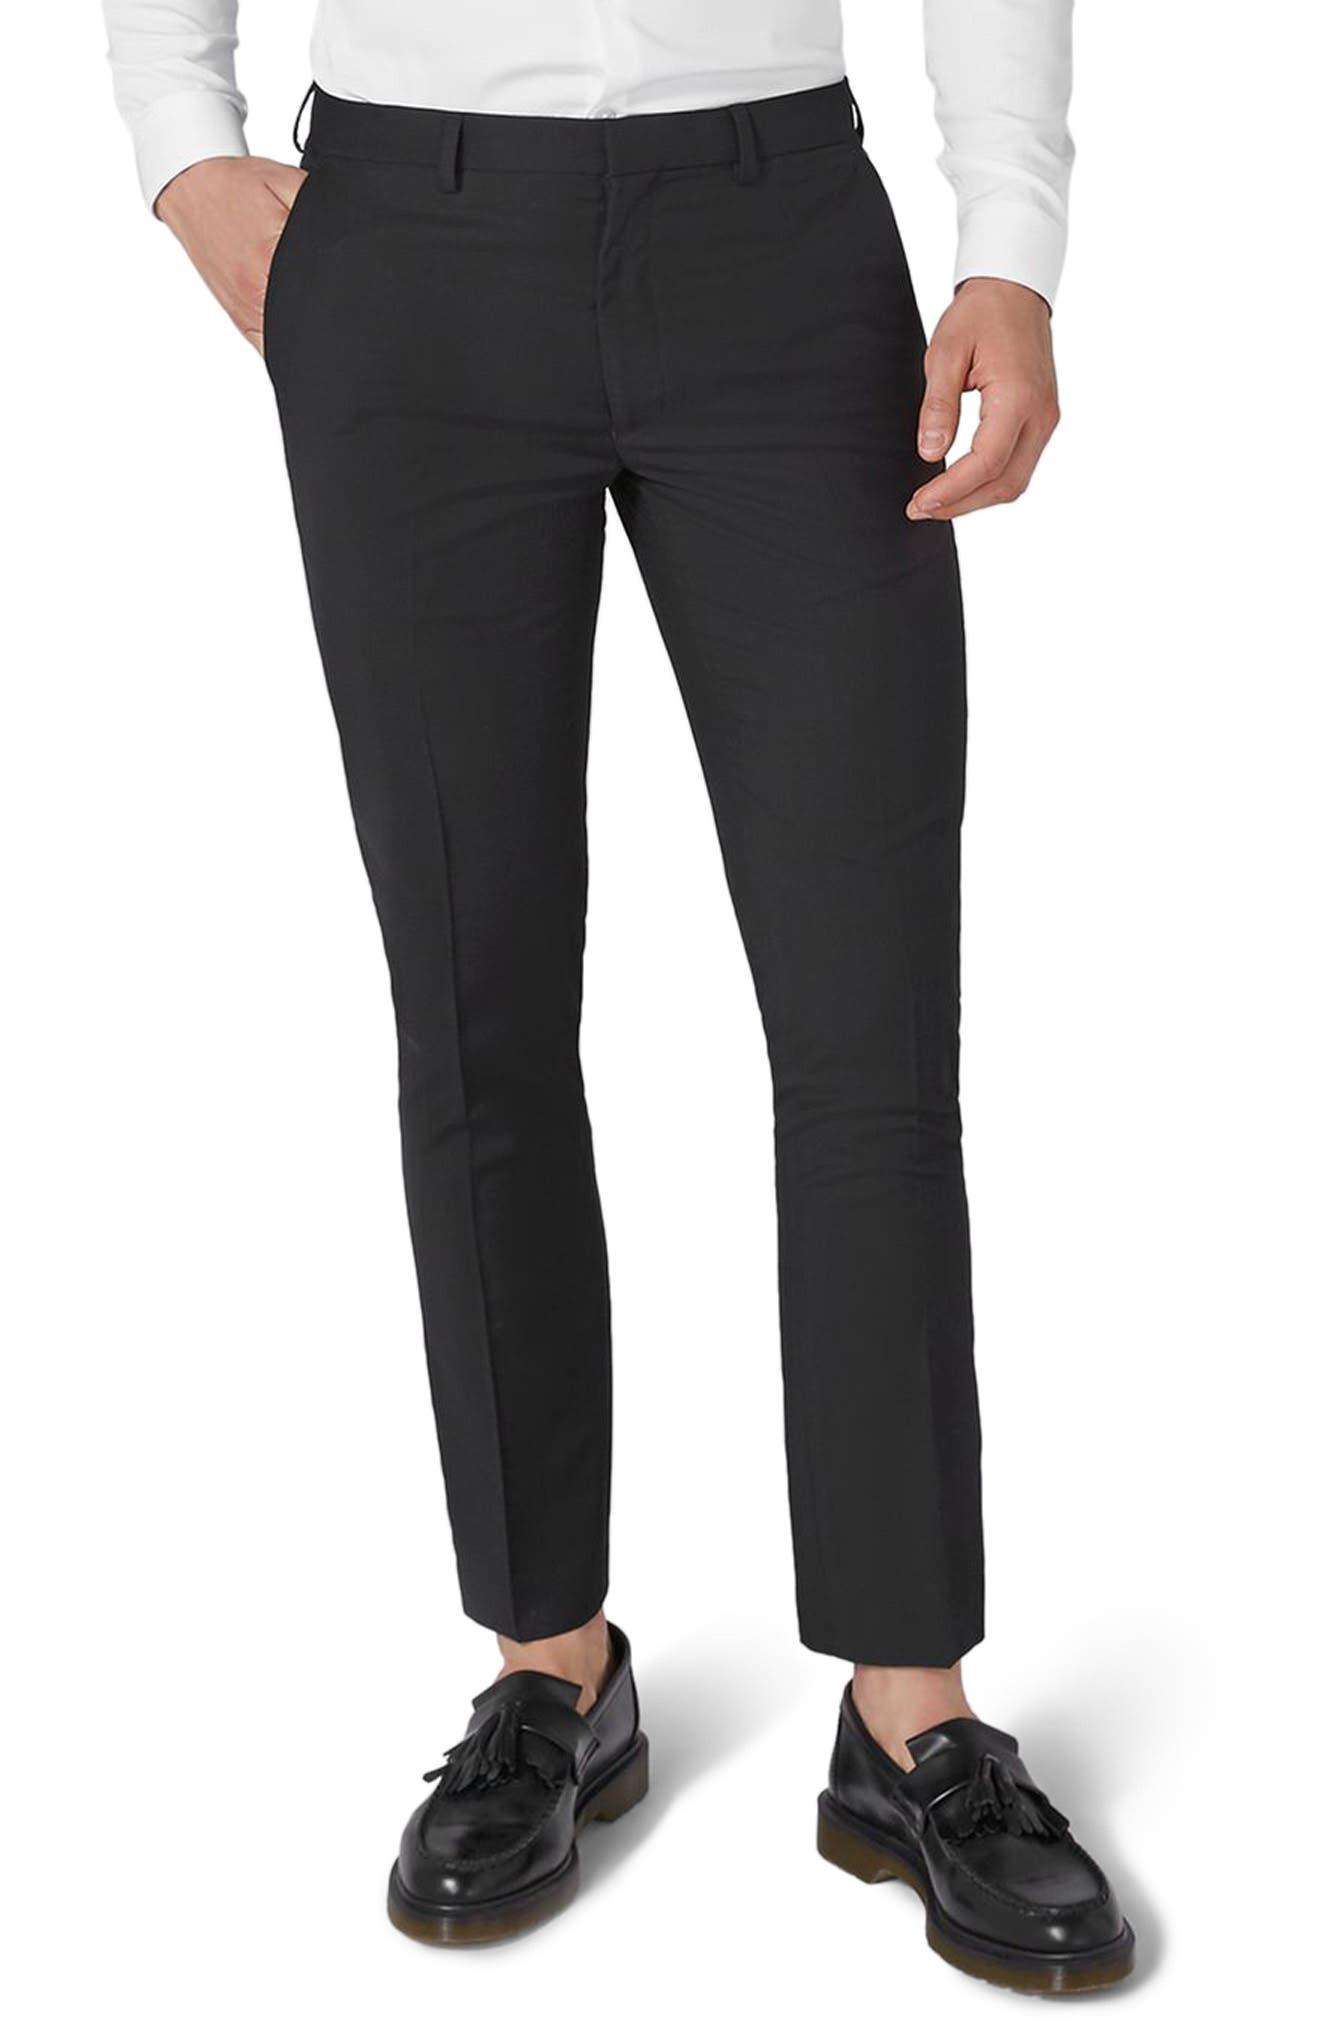 Black Skinny Fit Trousers,                             Main thumbnail 1, color,                             Black